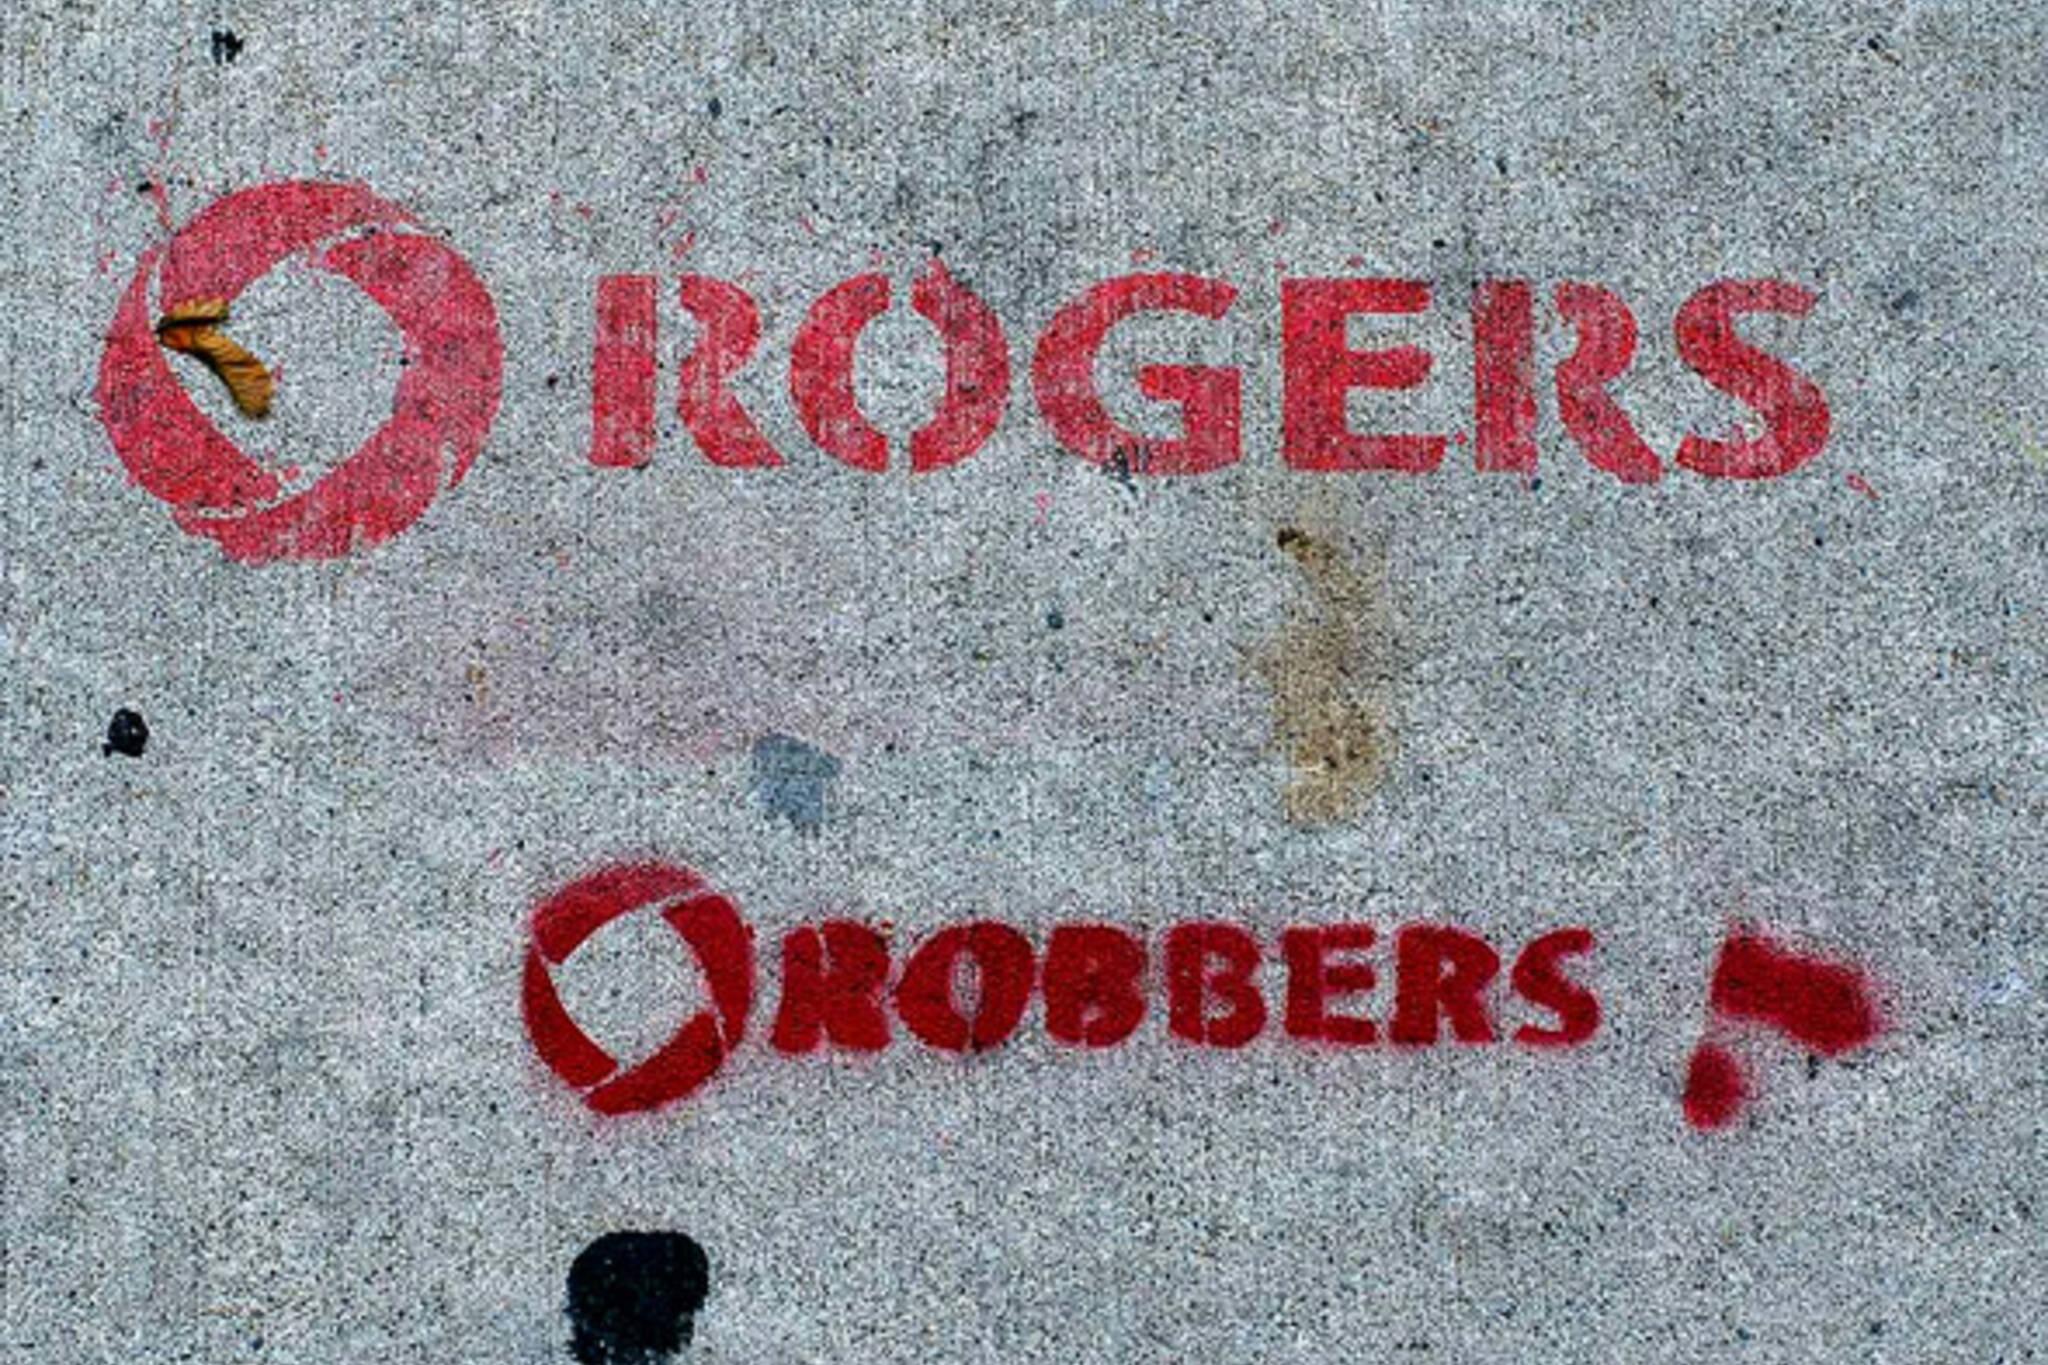 Rogers Sidewalk Ads